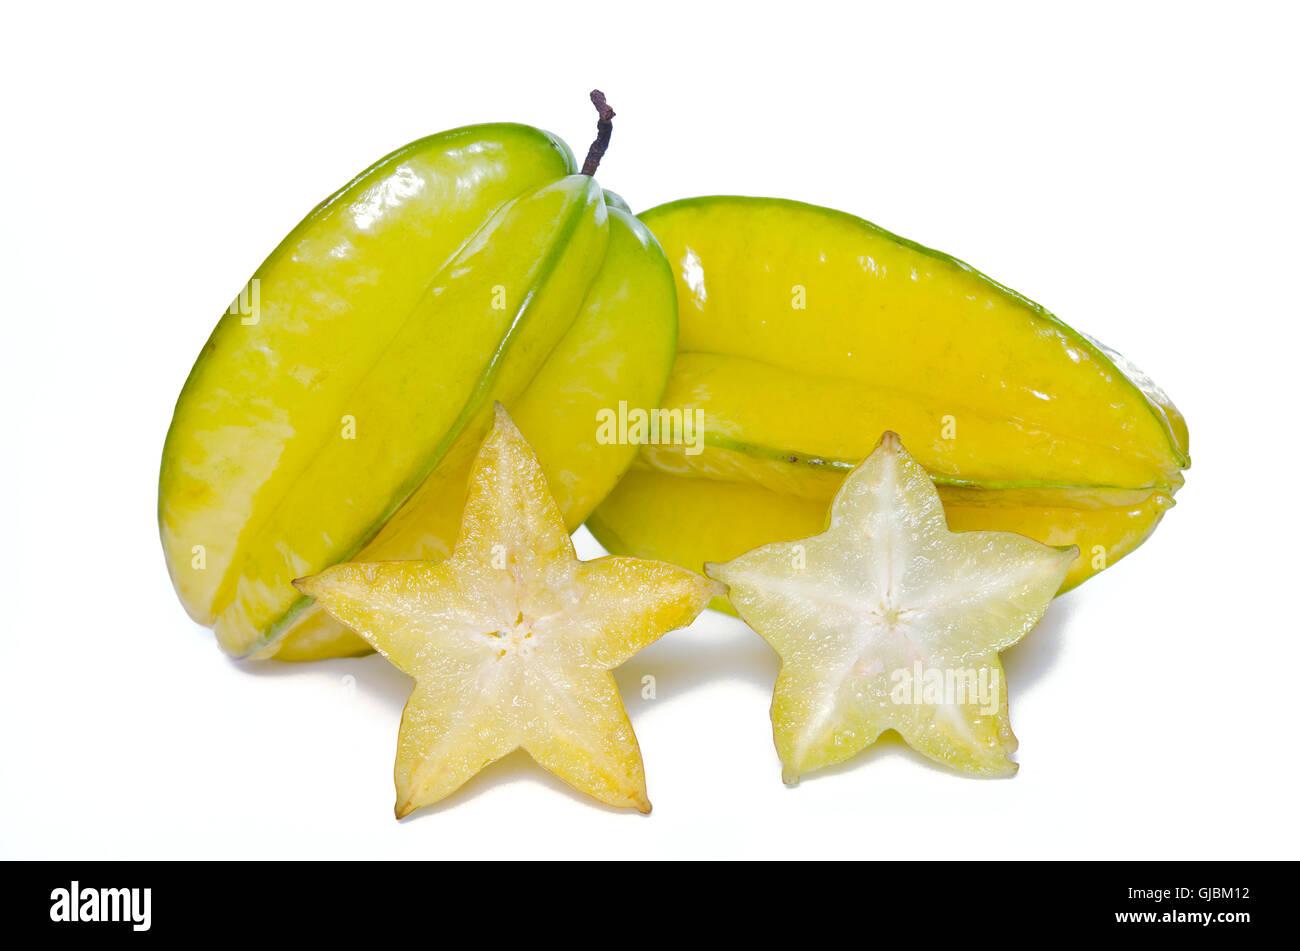 Star apple fruit (Also called as Carambola, starfruit, Averrhoa apple carambola, Bilimbi, Arkin in Florida, Dah - Stock Image